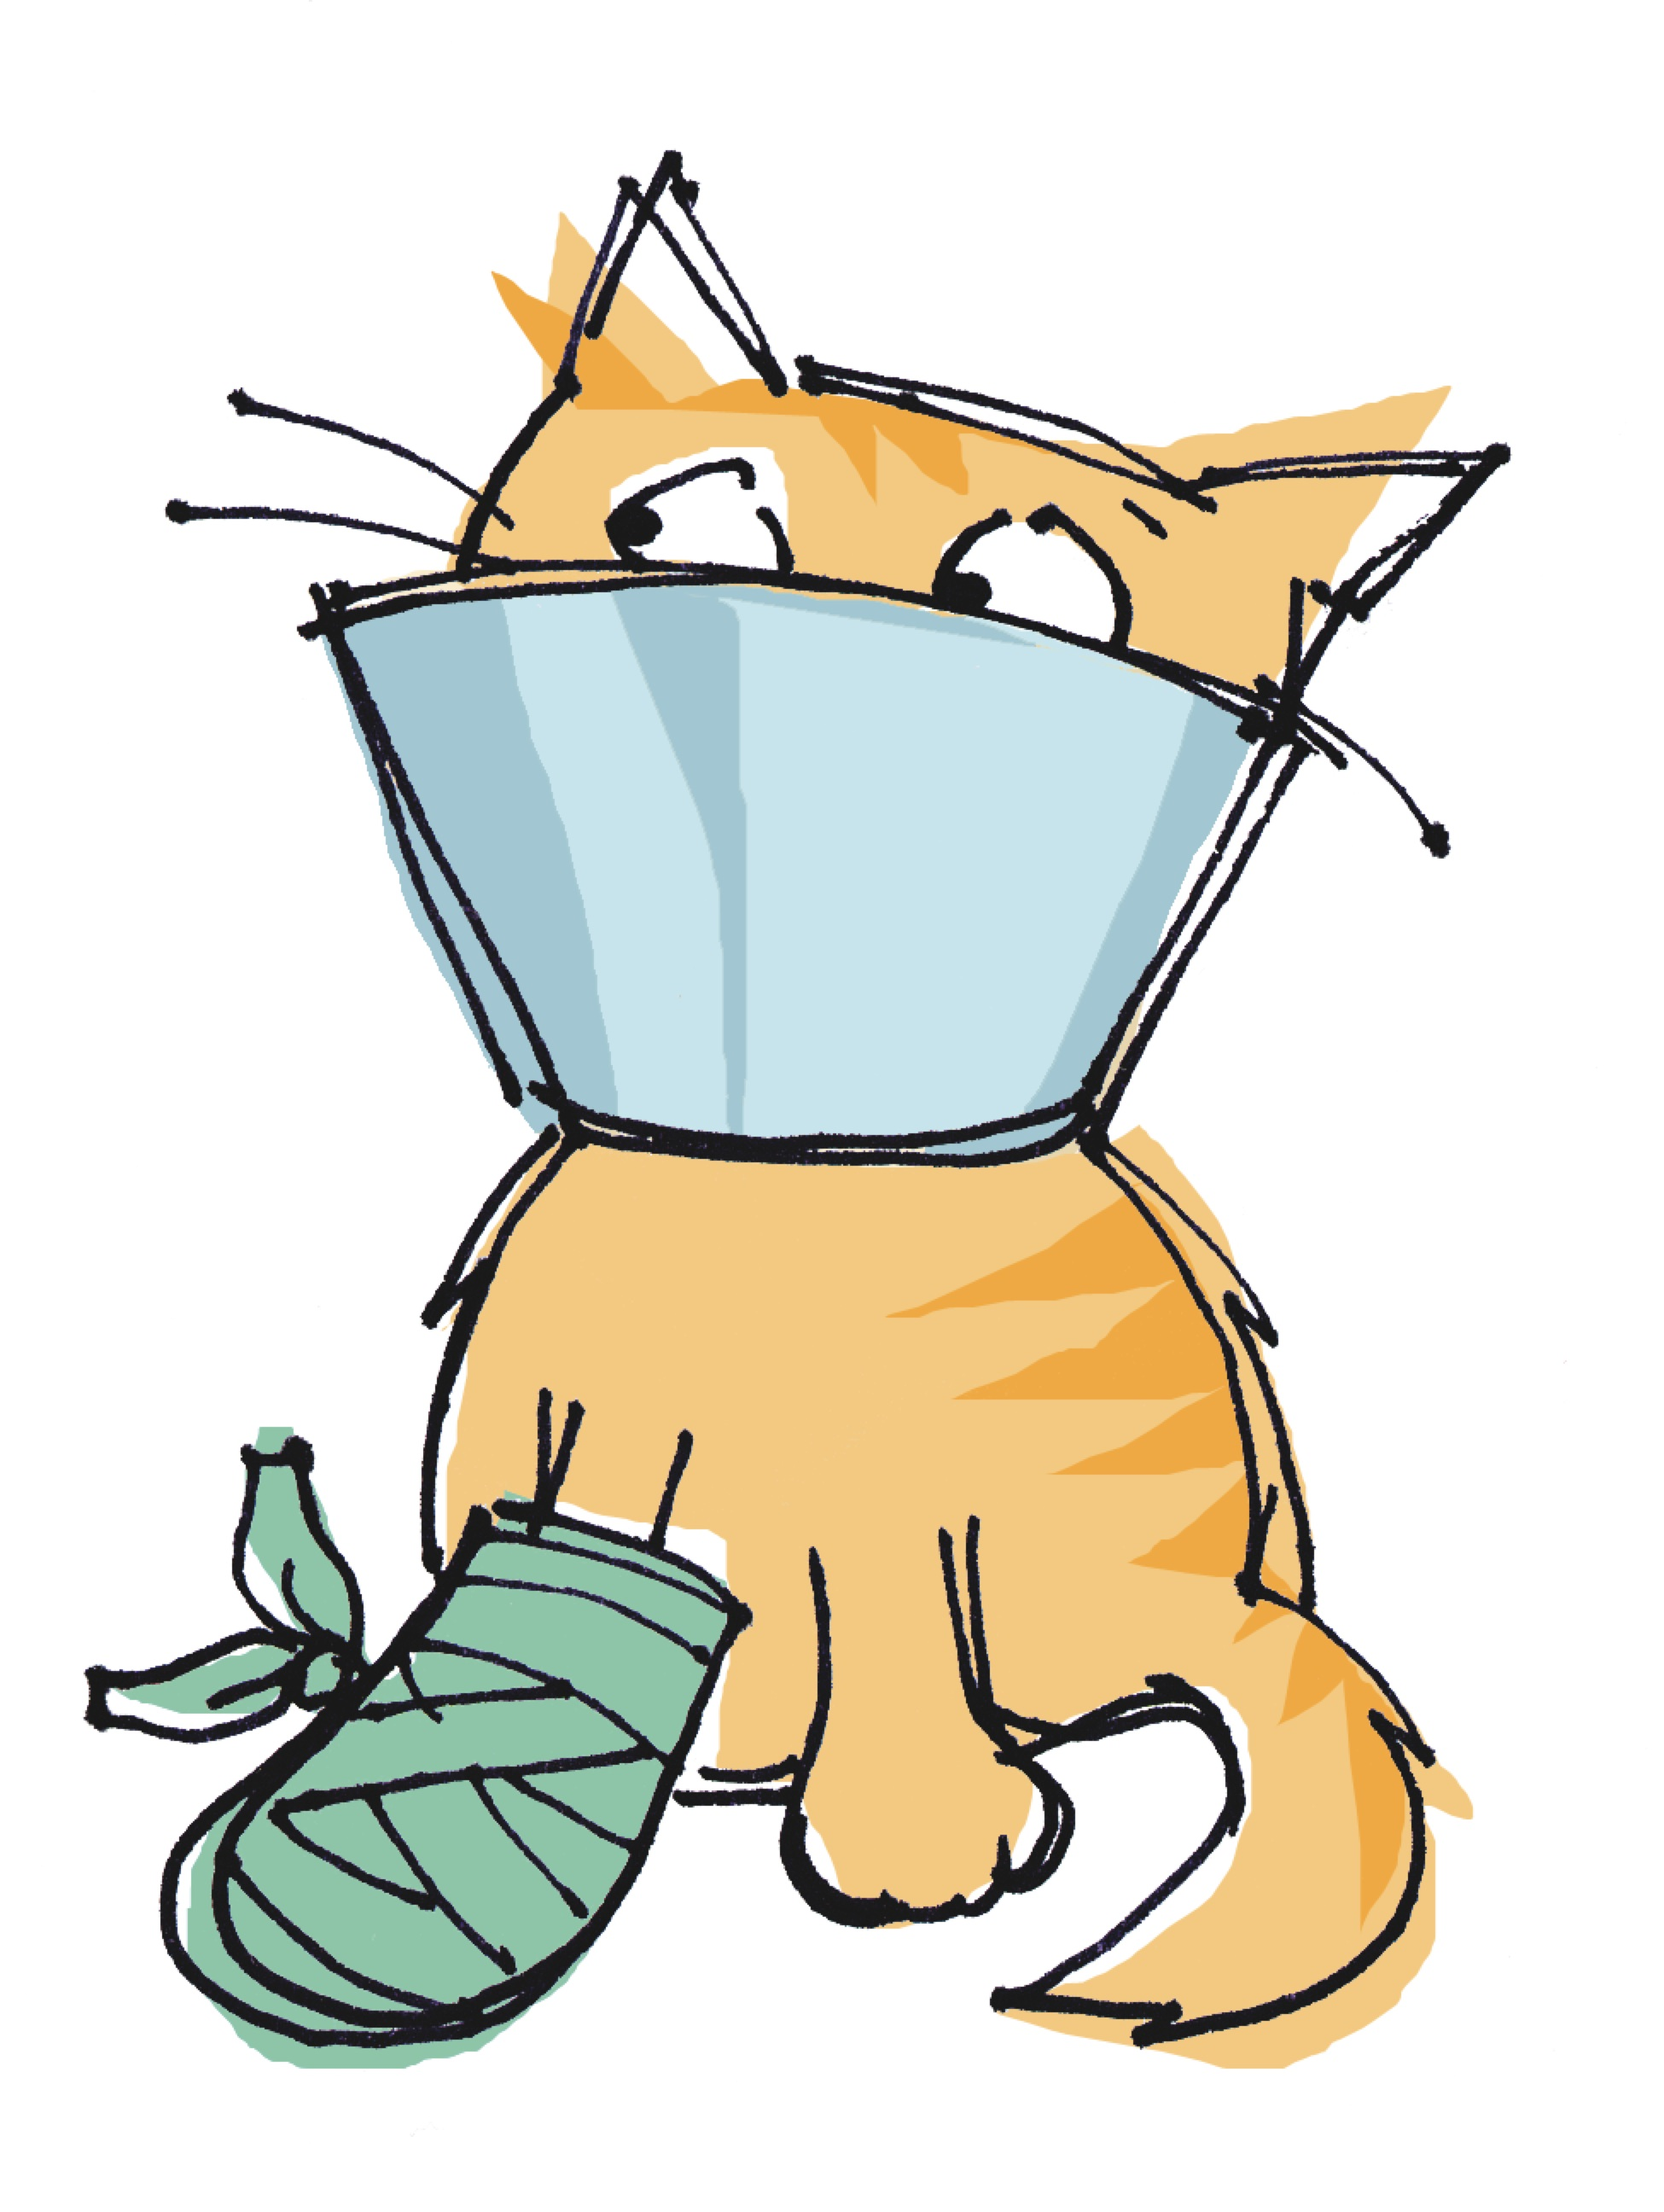 Cartoon veterinarian clipart svg library Veterinarian Clipart | Free download best Veterinarian Clipart on ... svg library